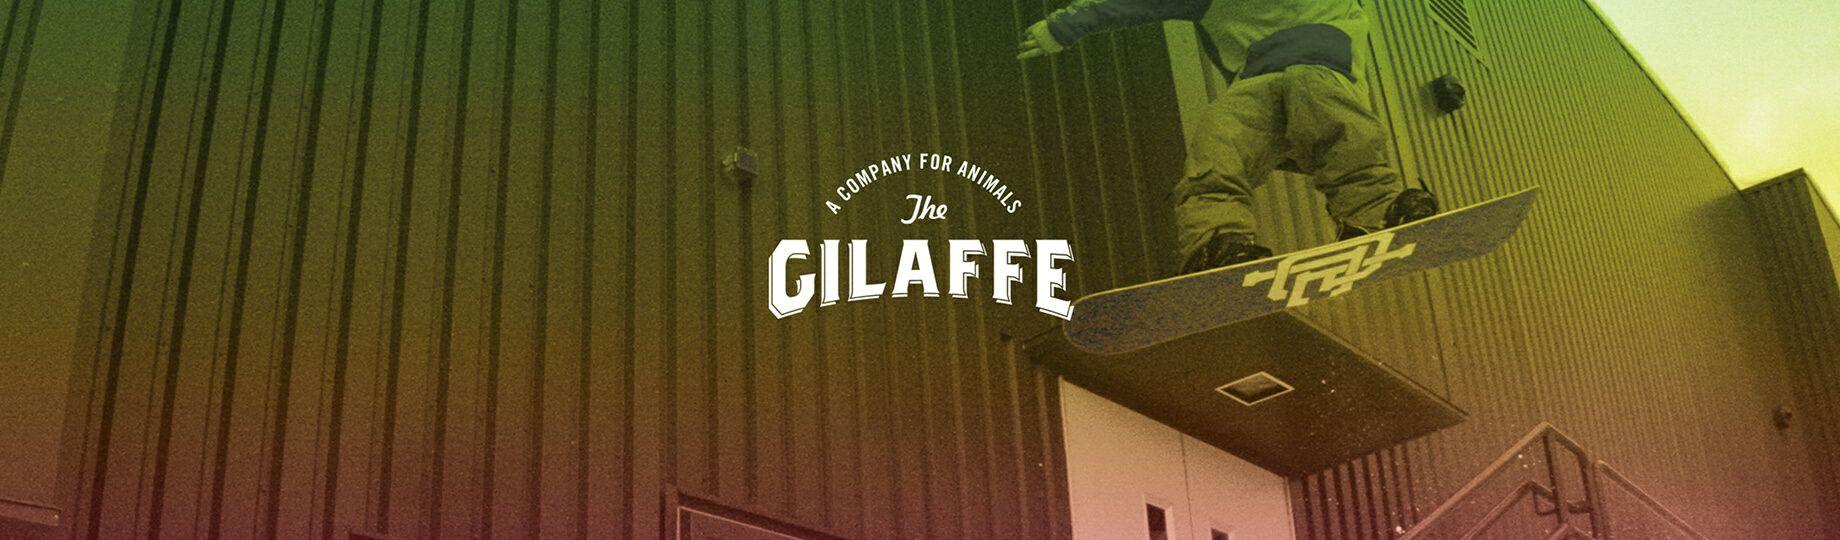 GiLAFFEメイン画像